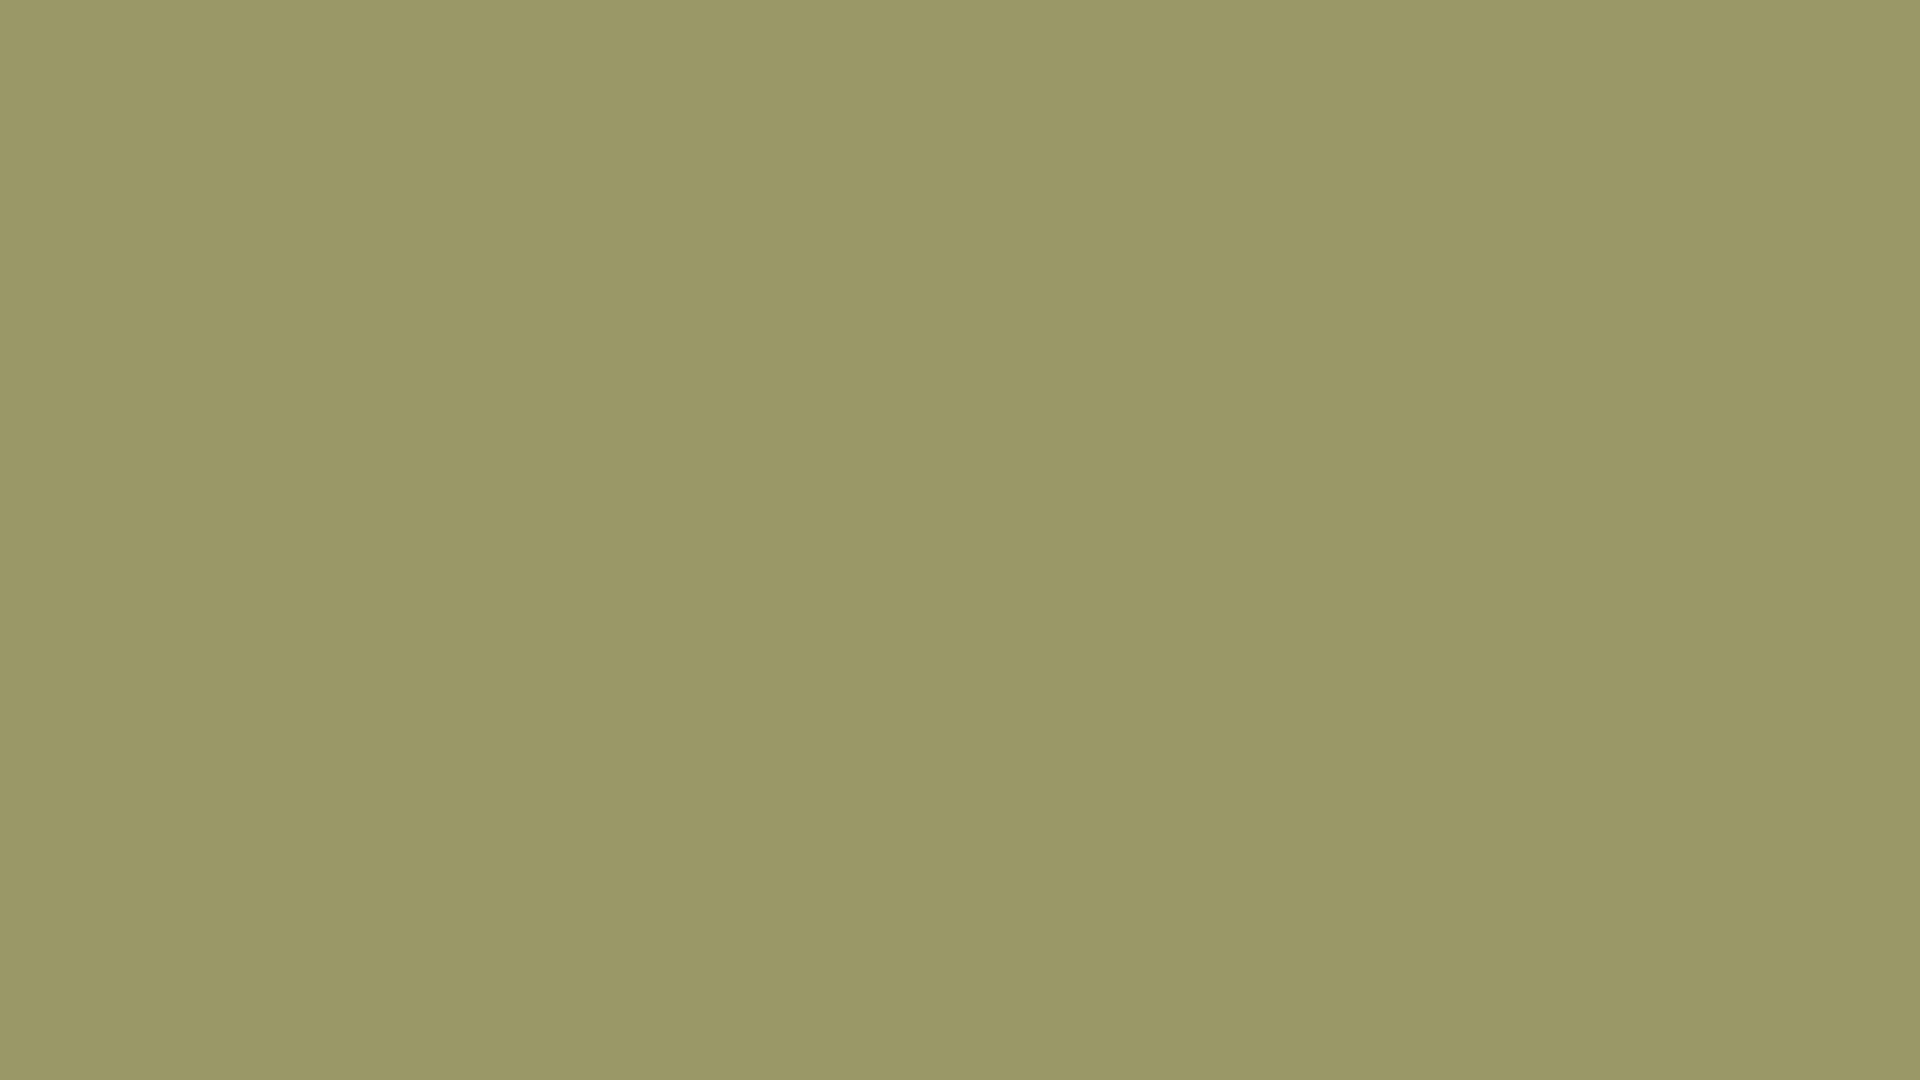 Olive Green Wallpaper